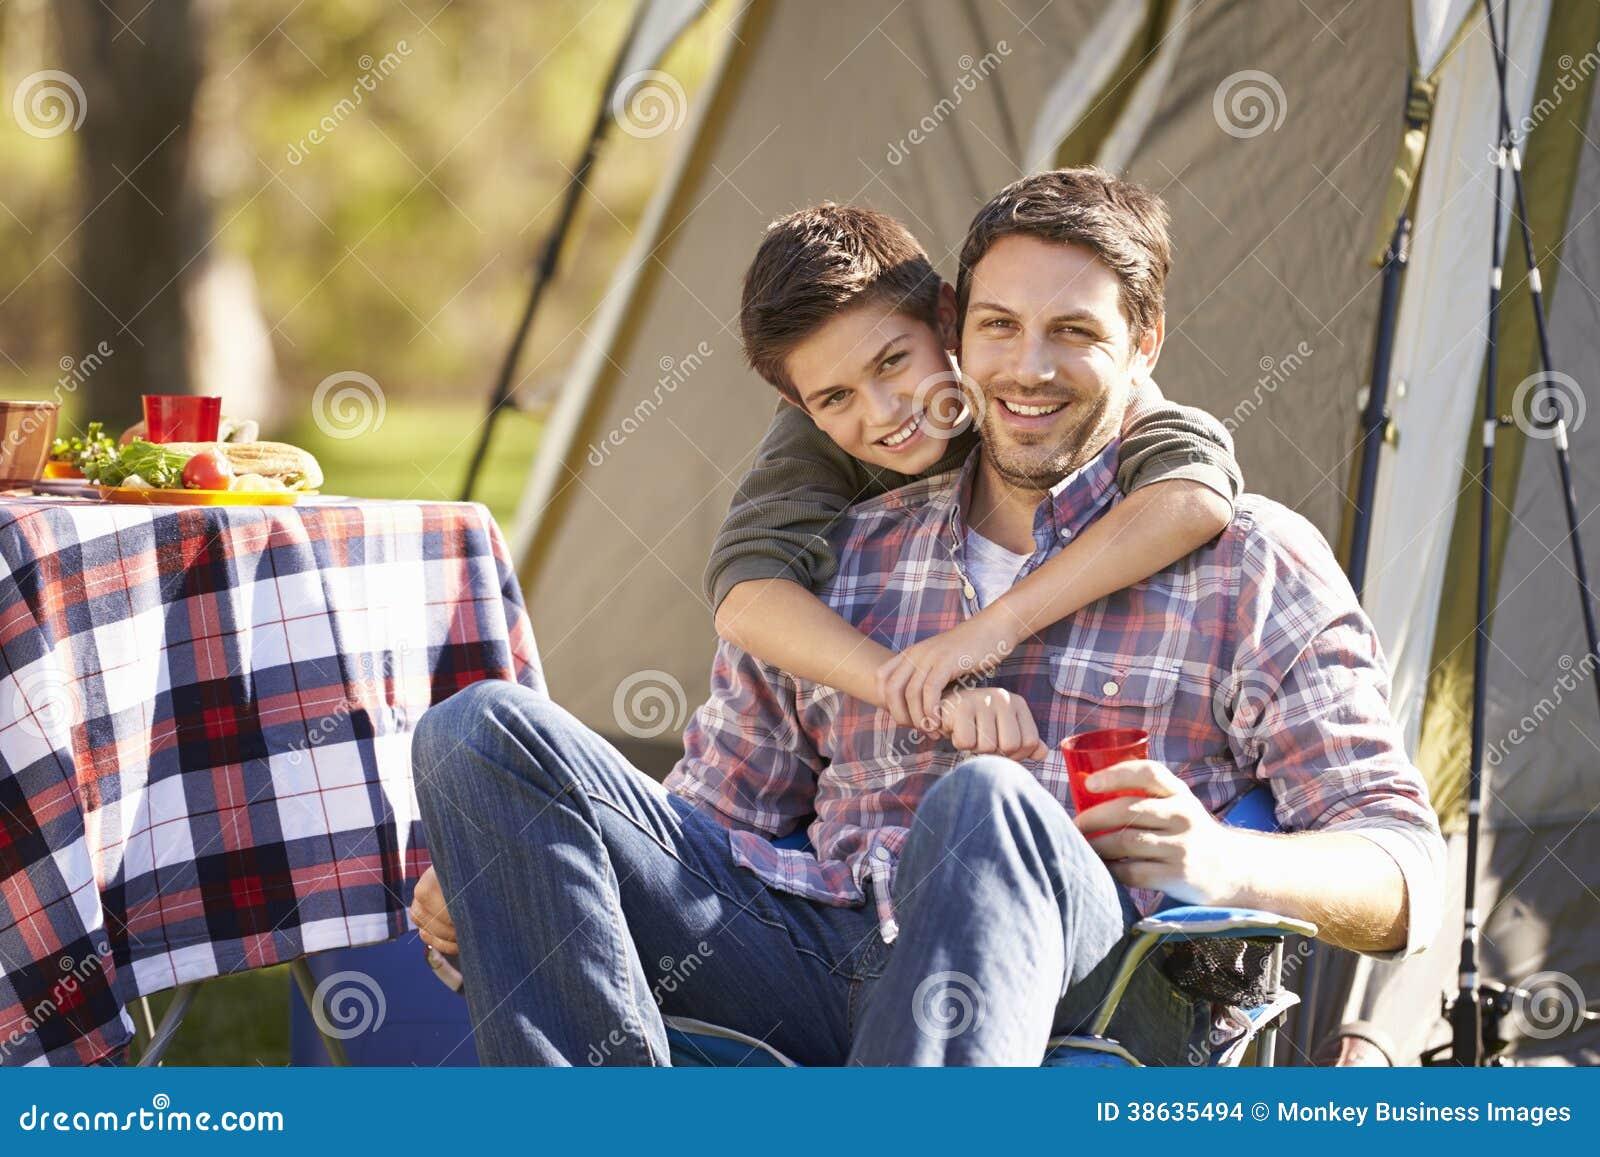 FaderAnd Son Enjoying campa ferie